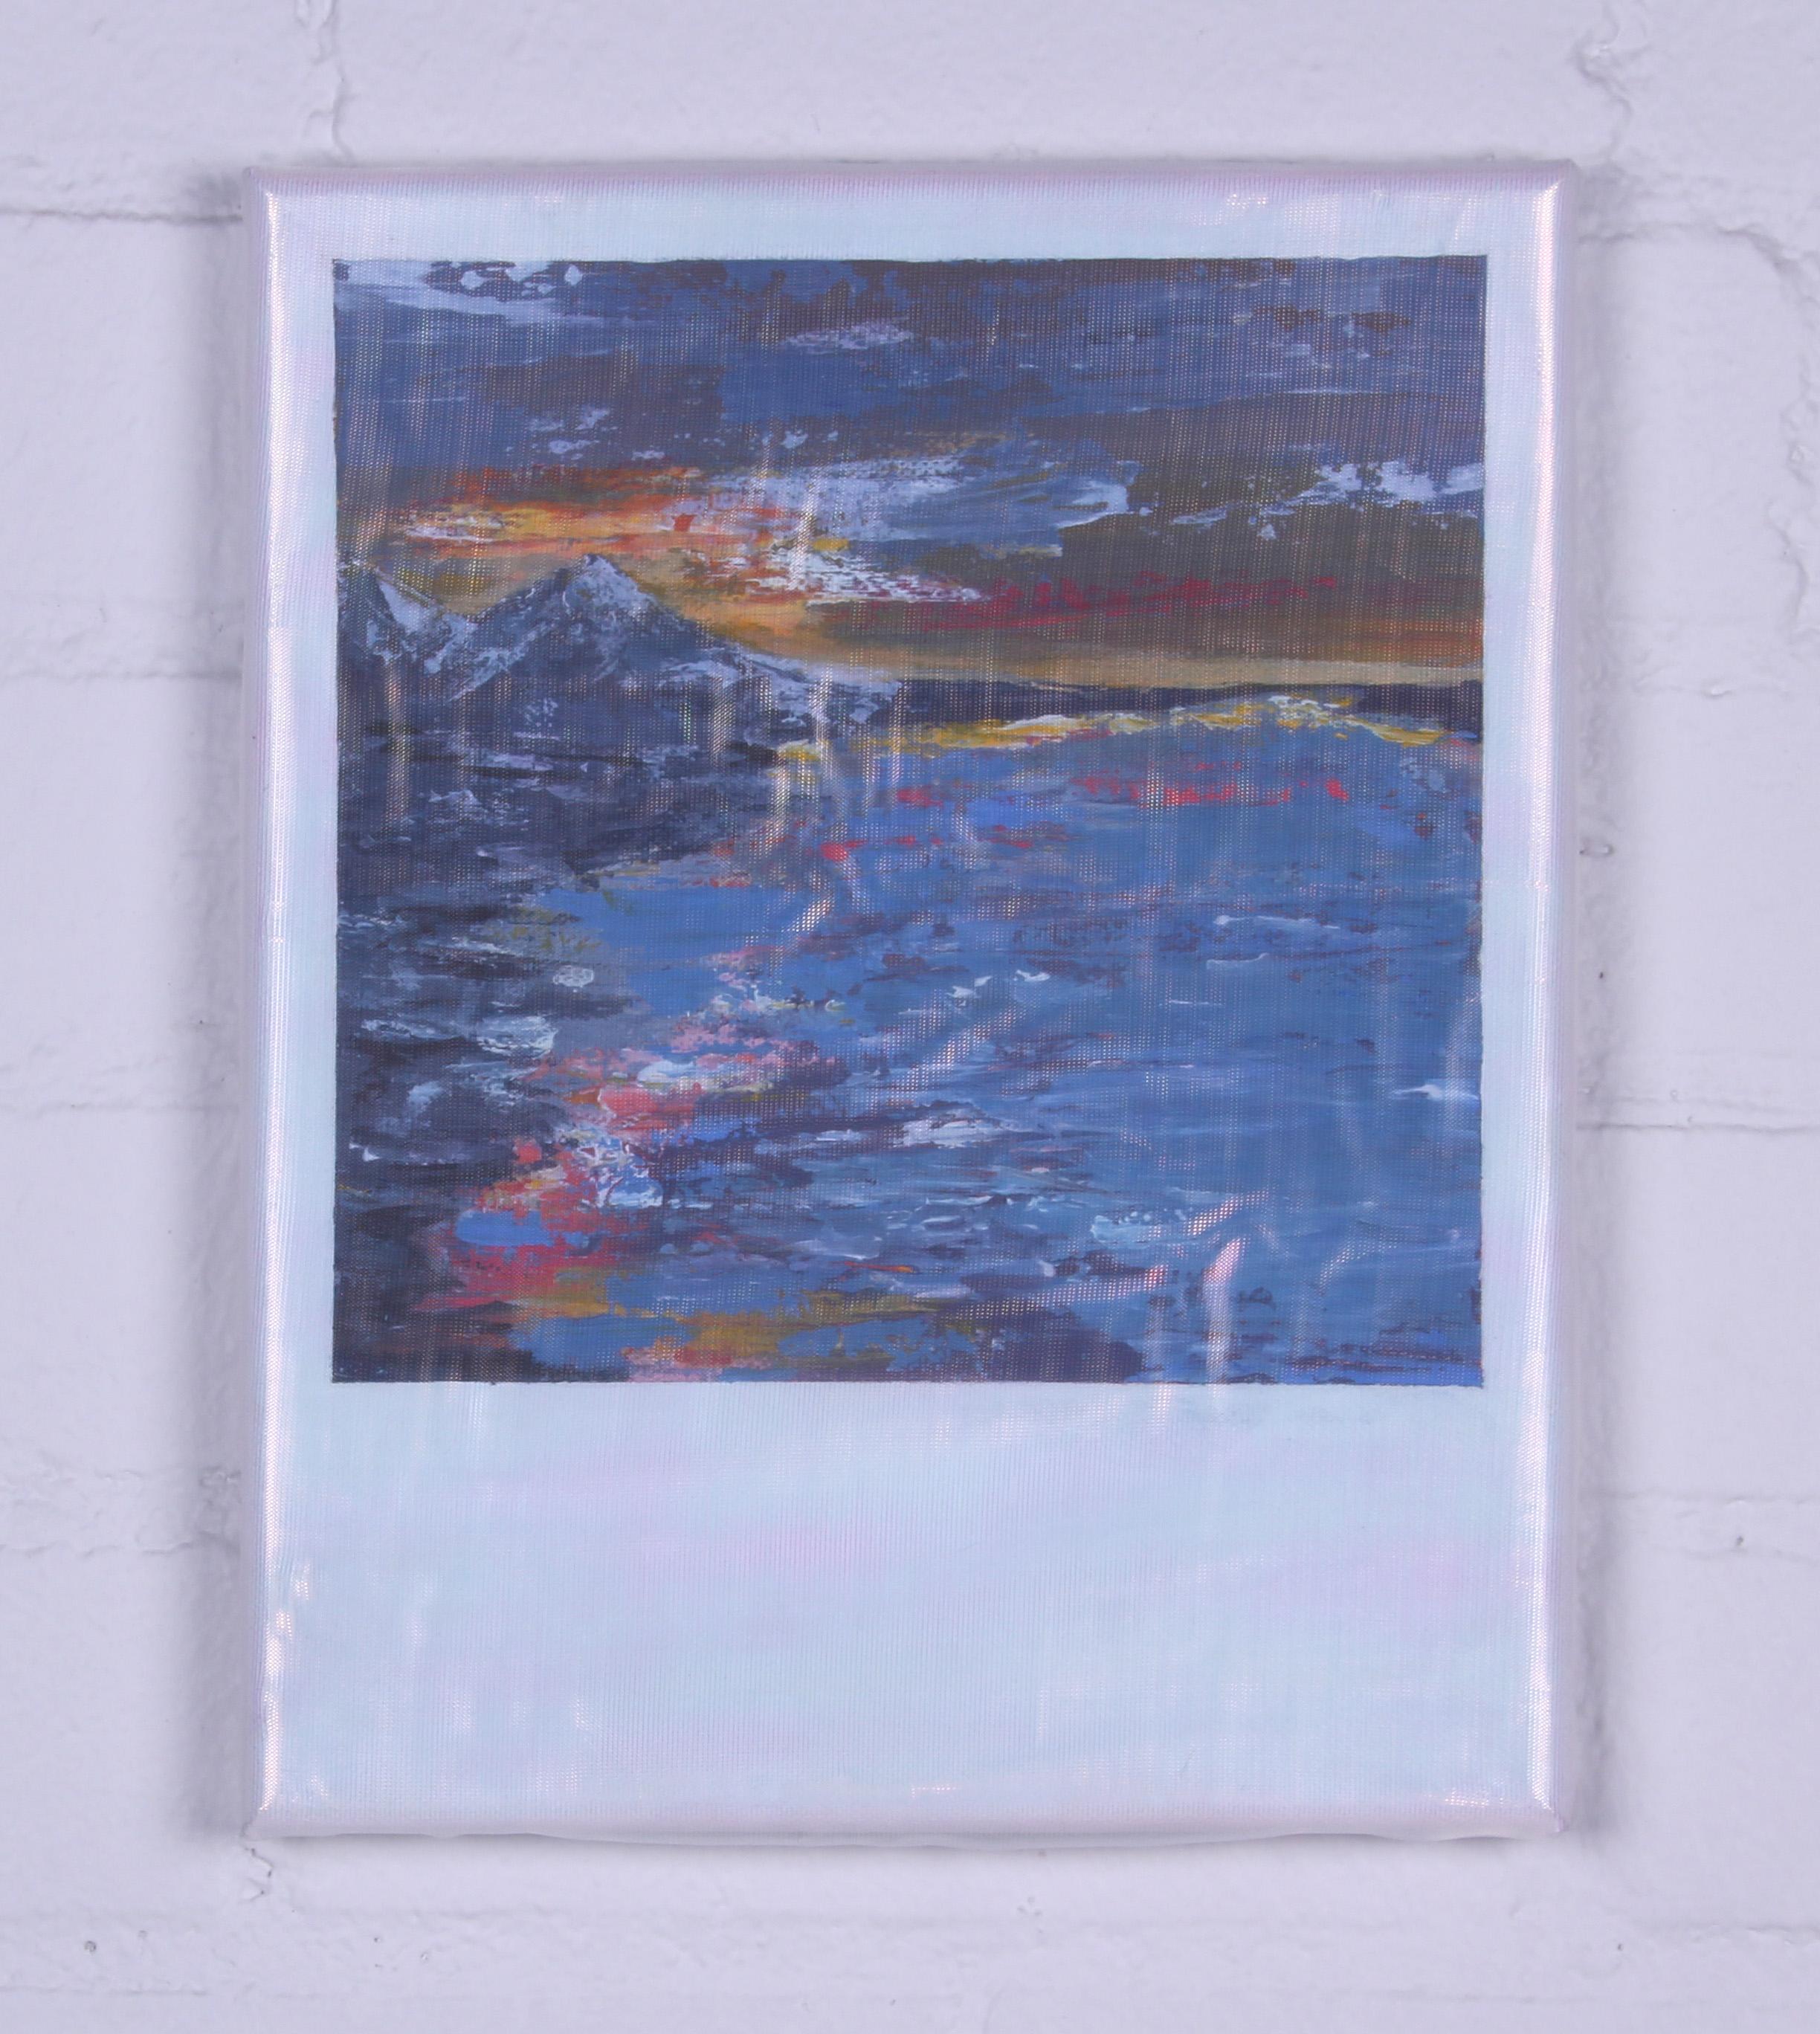 Iridescent Landscape 2, 2019